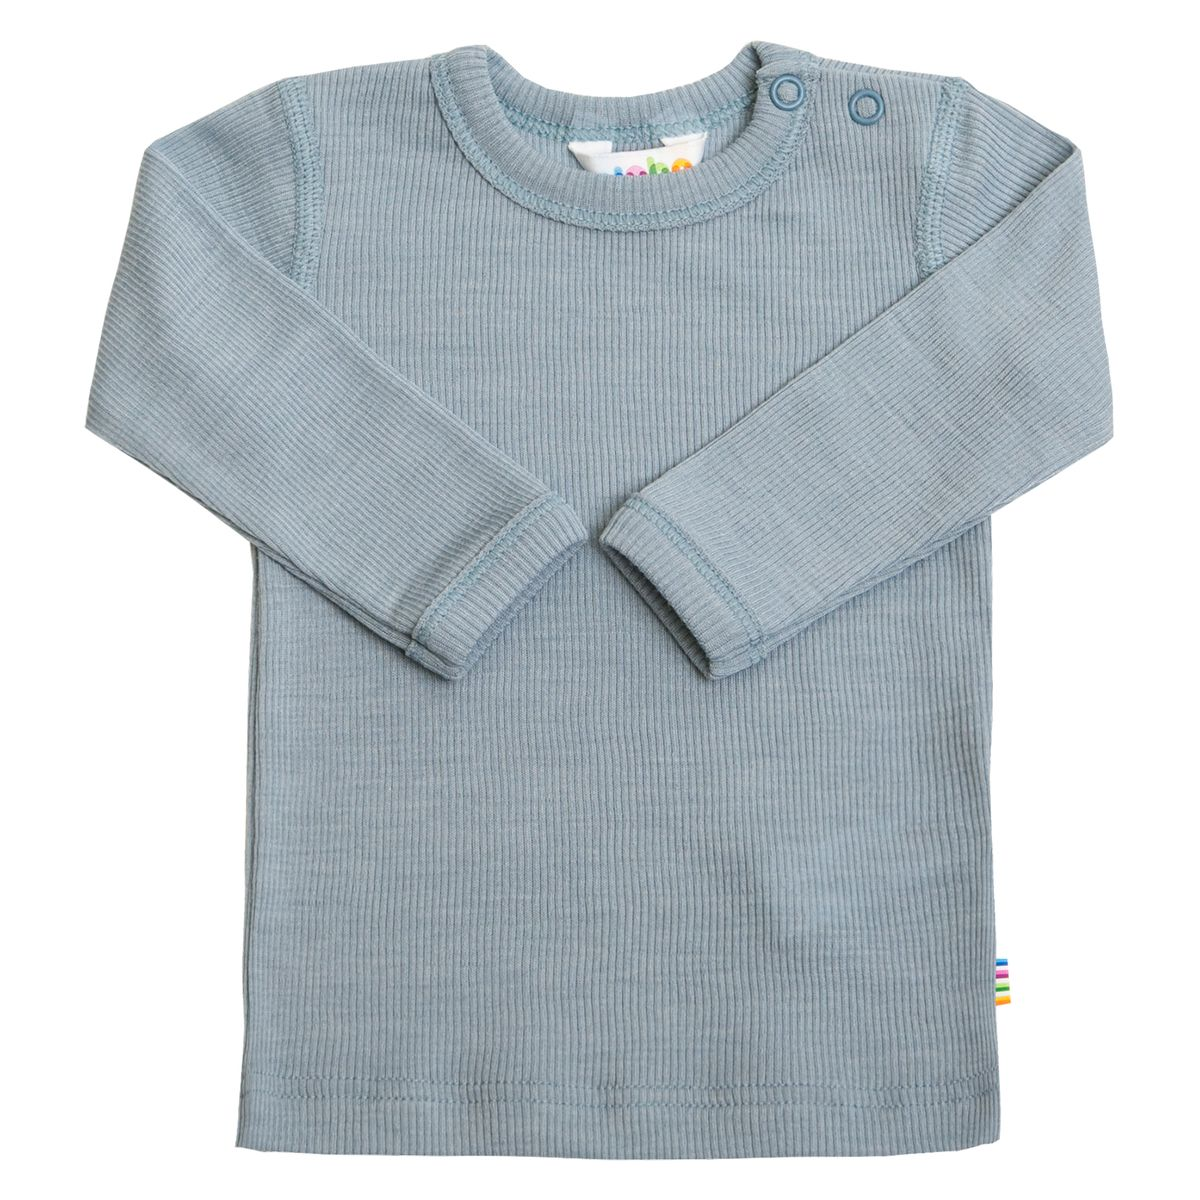 Blouse w/long sleeves